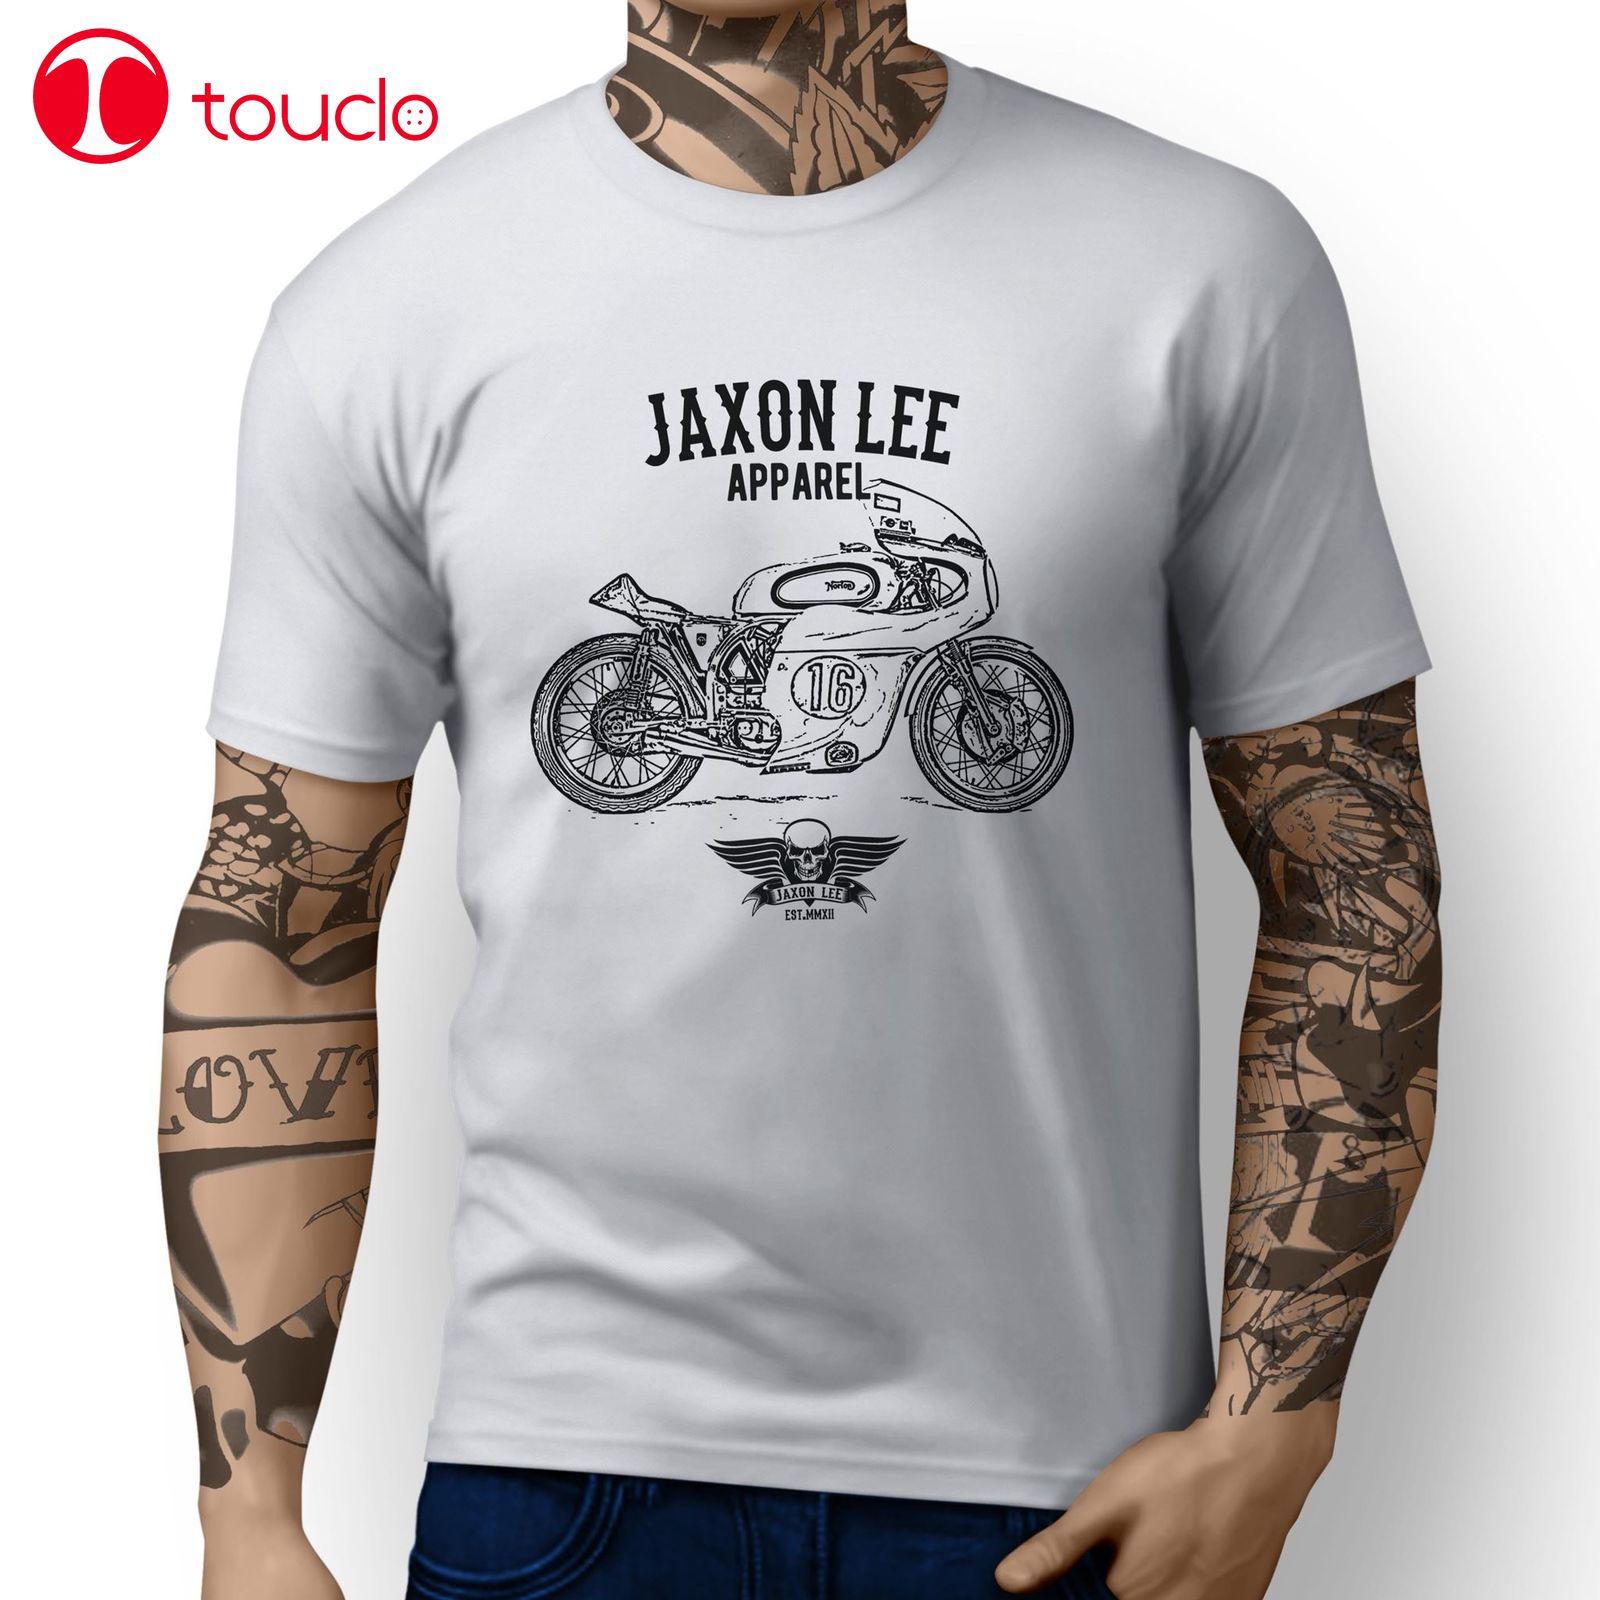 2019 Cool italiano clásico moto Manx inspirado motocicleta arte diseño camiseta sudadera